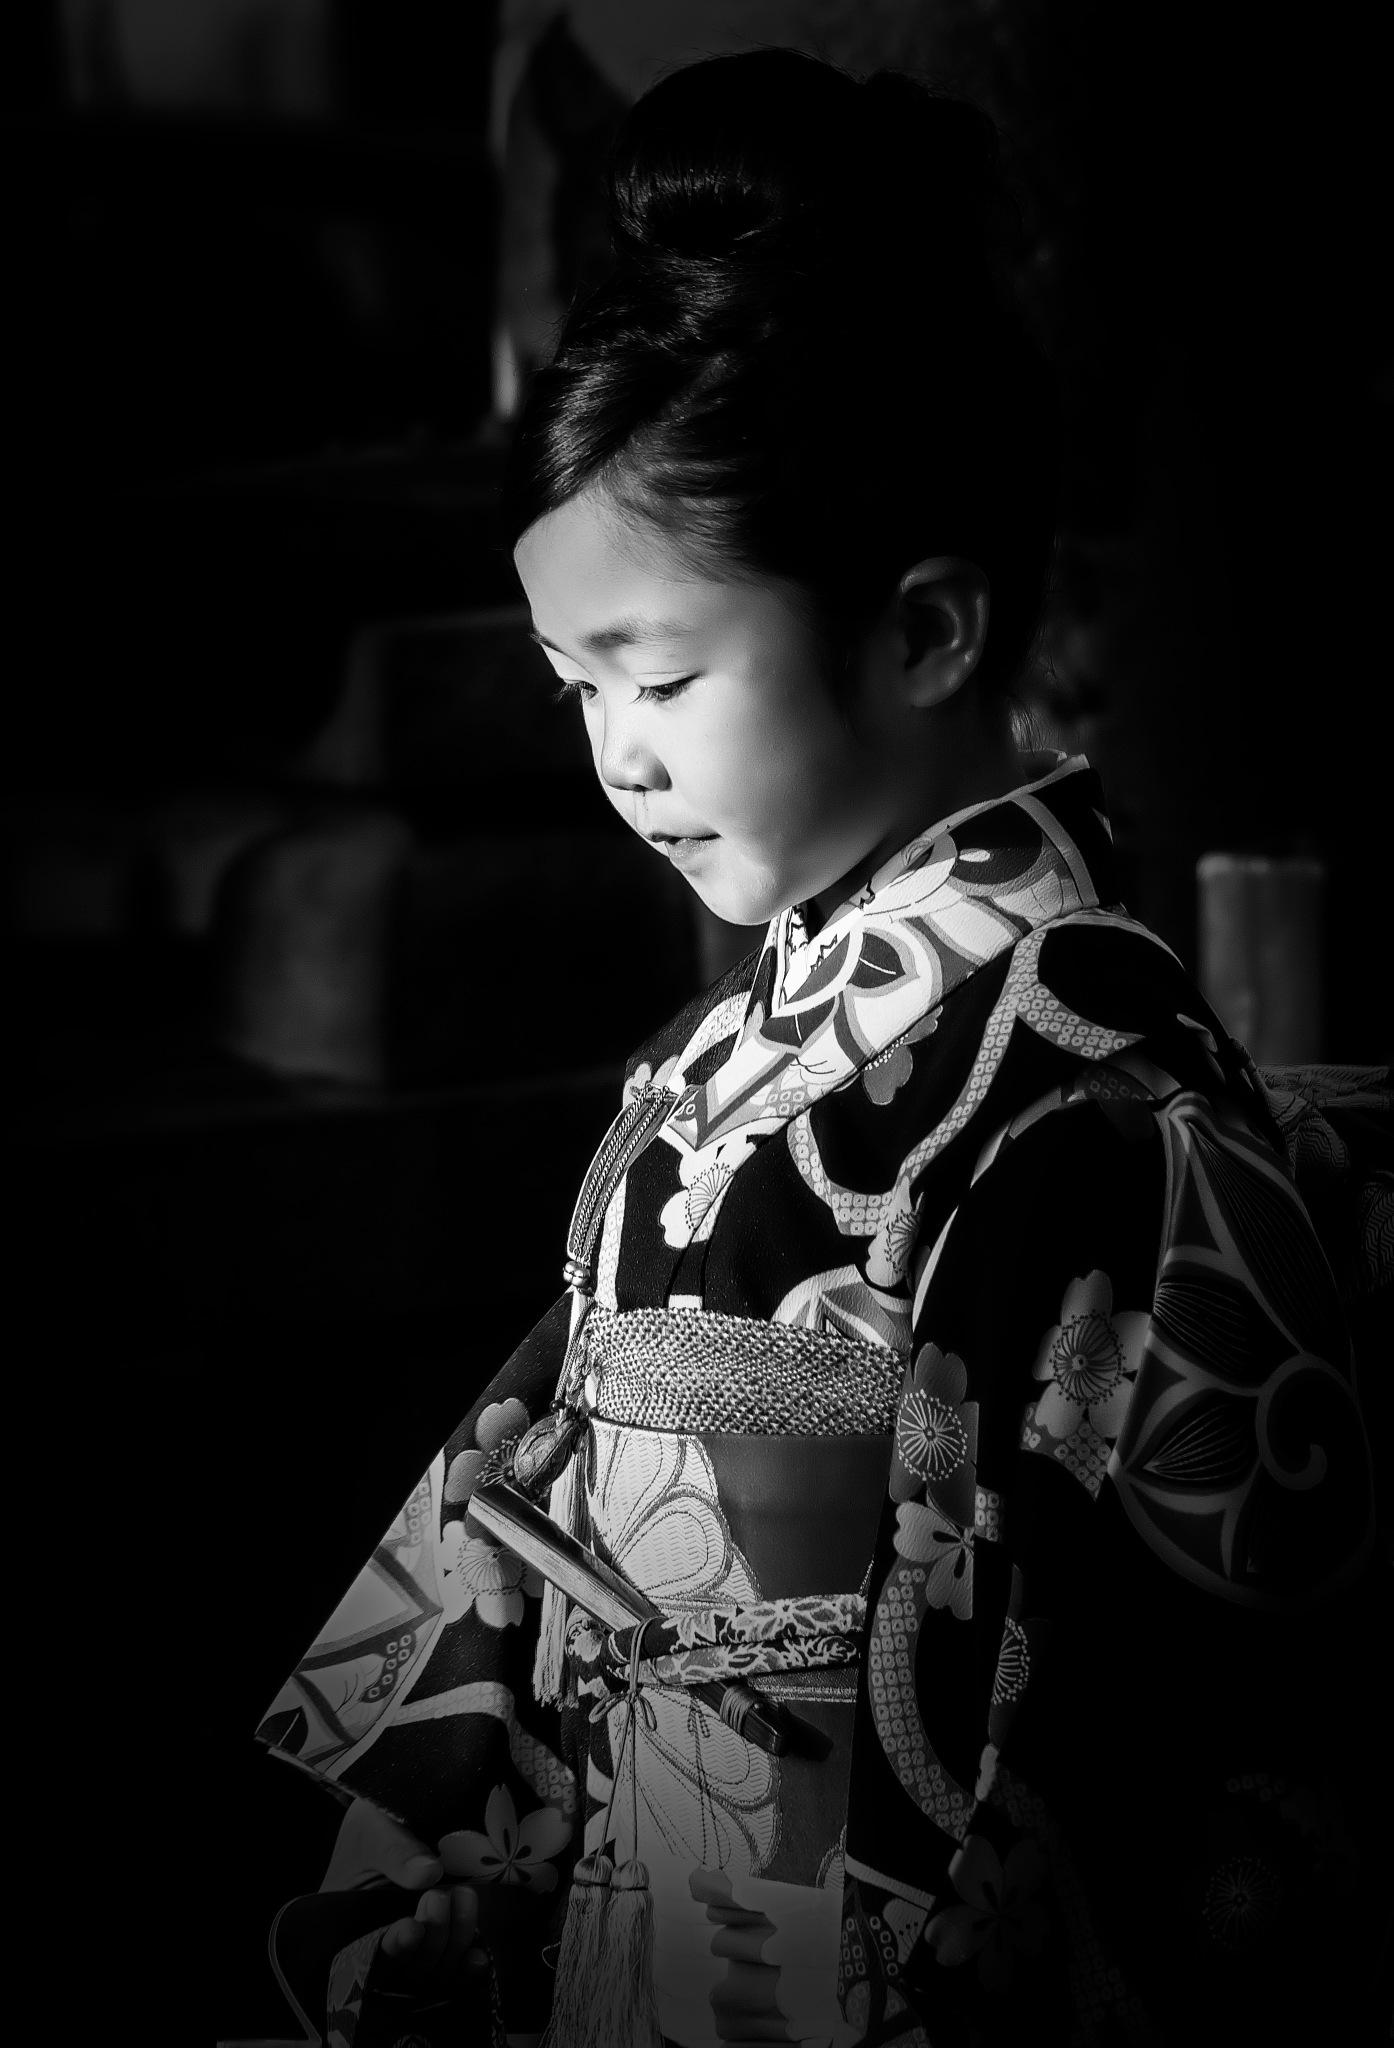 Giappone bimba a Kamakura. by Claudio Fantone